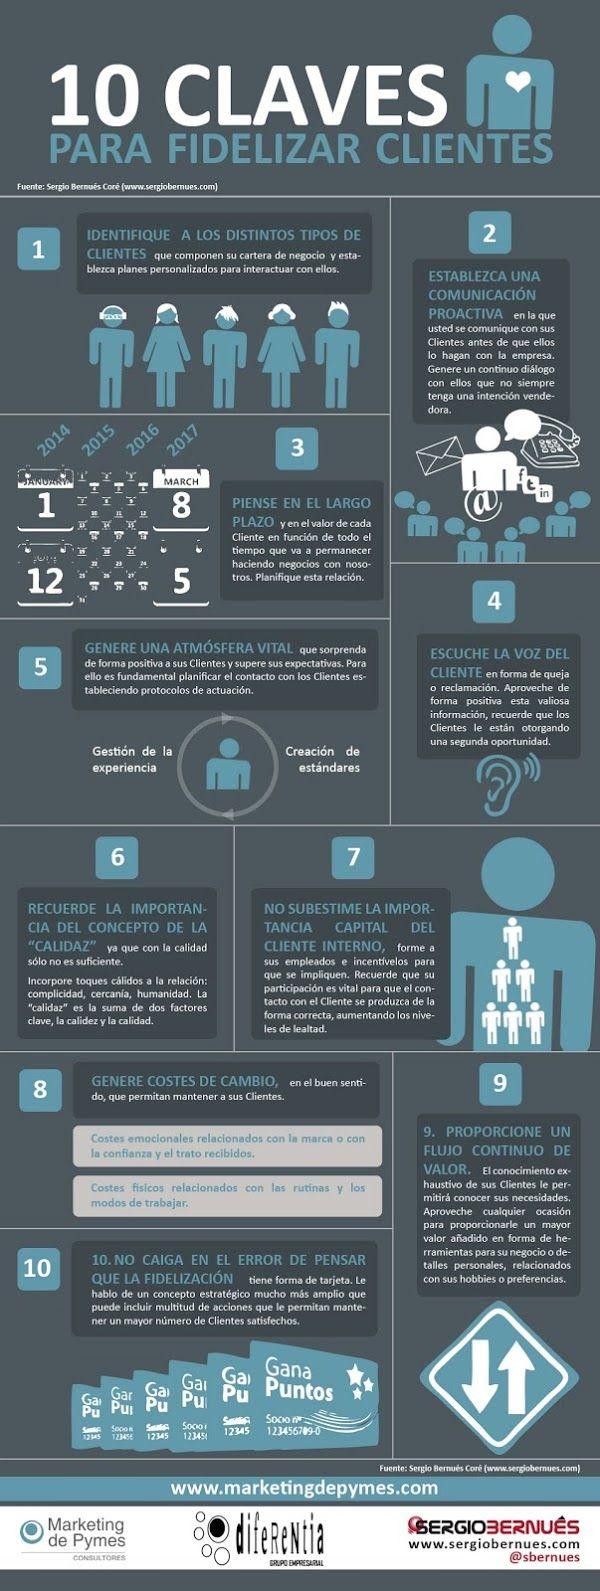 10 claves para fidelizar clientes